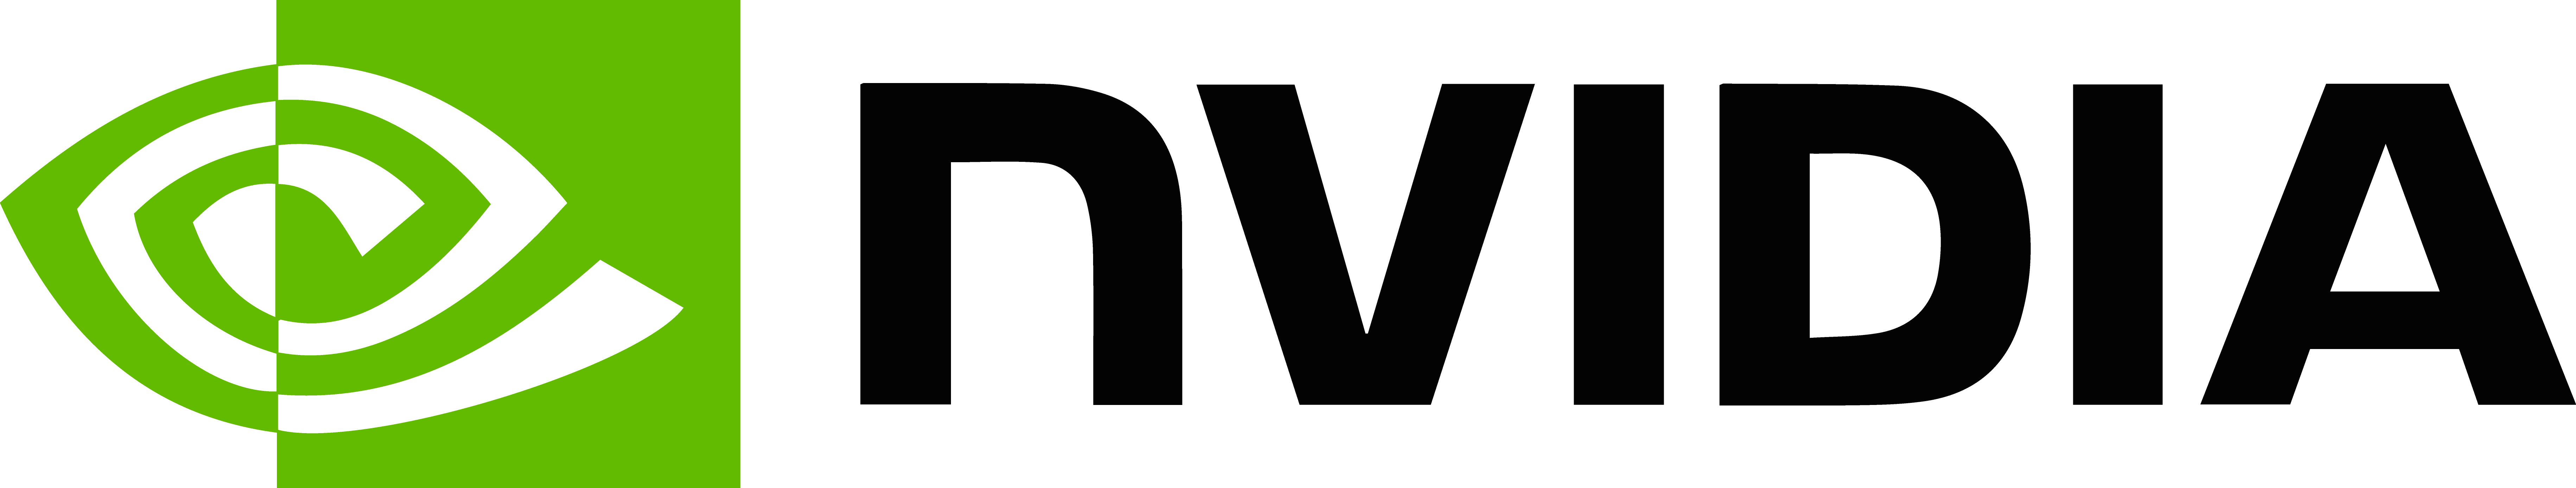 nvidia hd audio driver 1.3.36.6